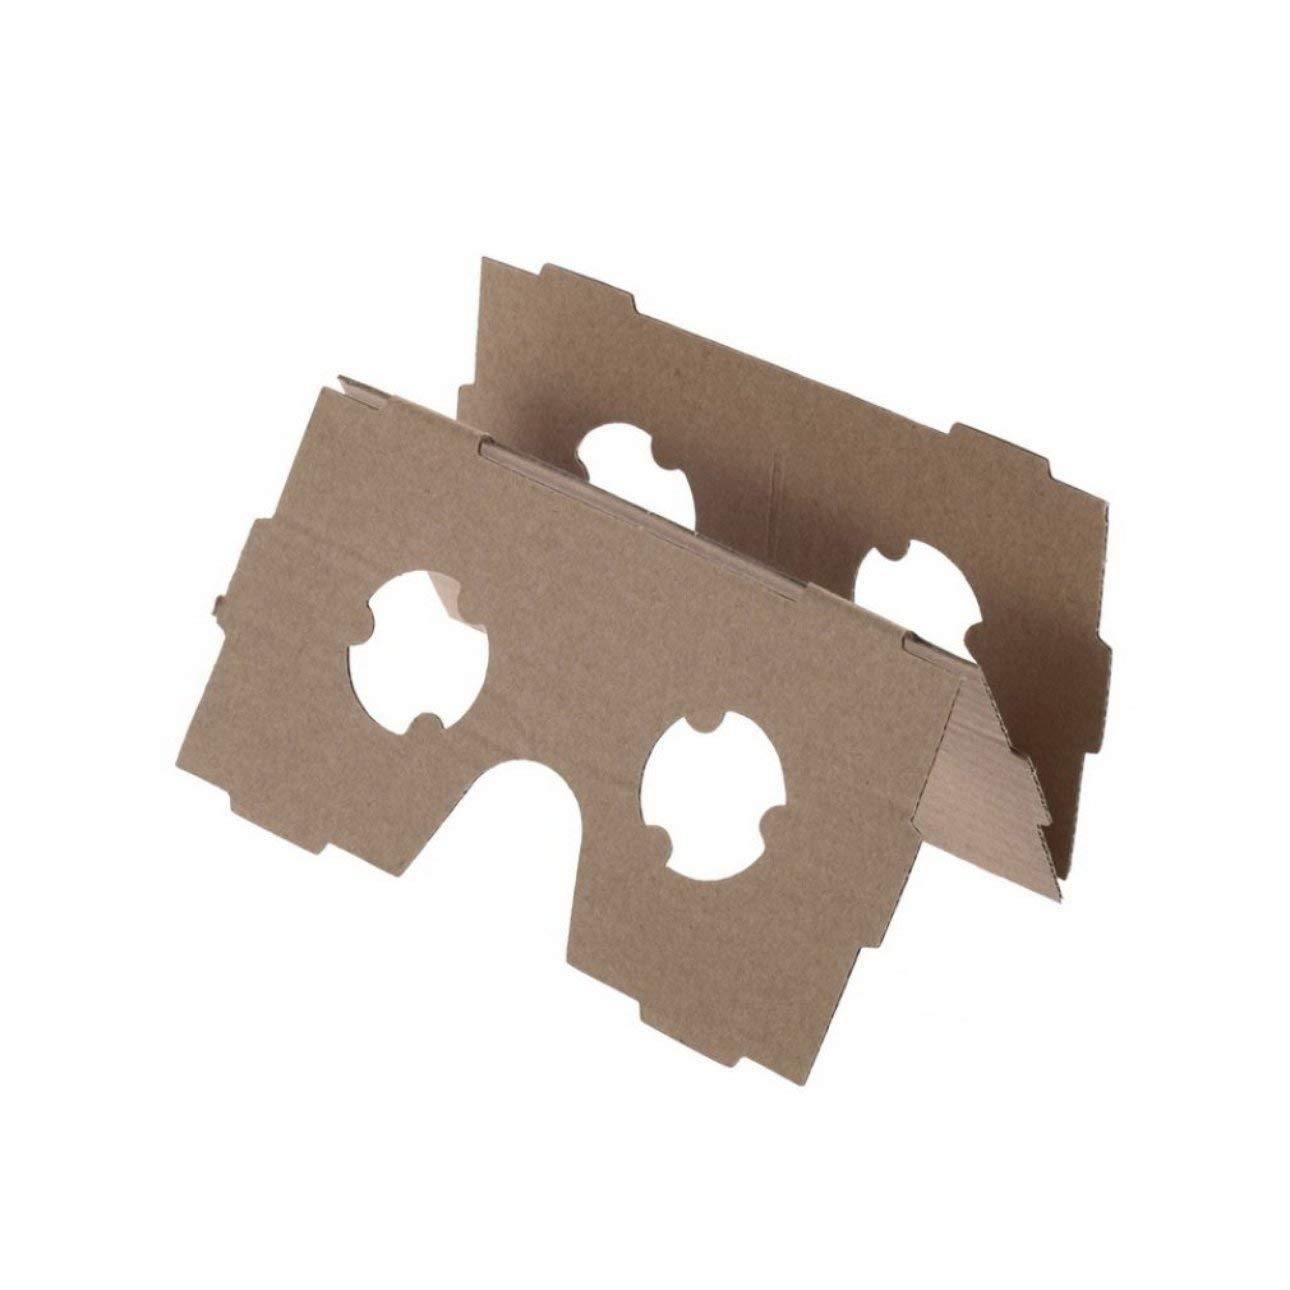 Liobaba DIY Cardboard 3D VR Virtual Reality Glasses for Smartphone DIY Magnet Google Cardboards Glasses by Liobaba (Image #4)